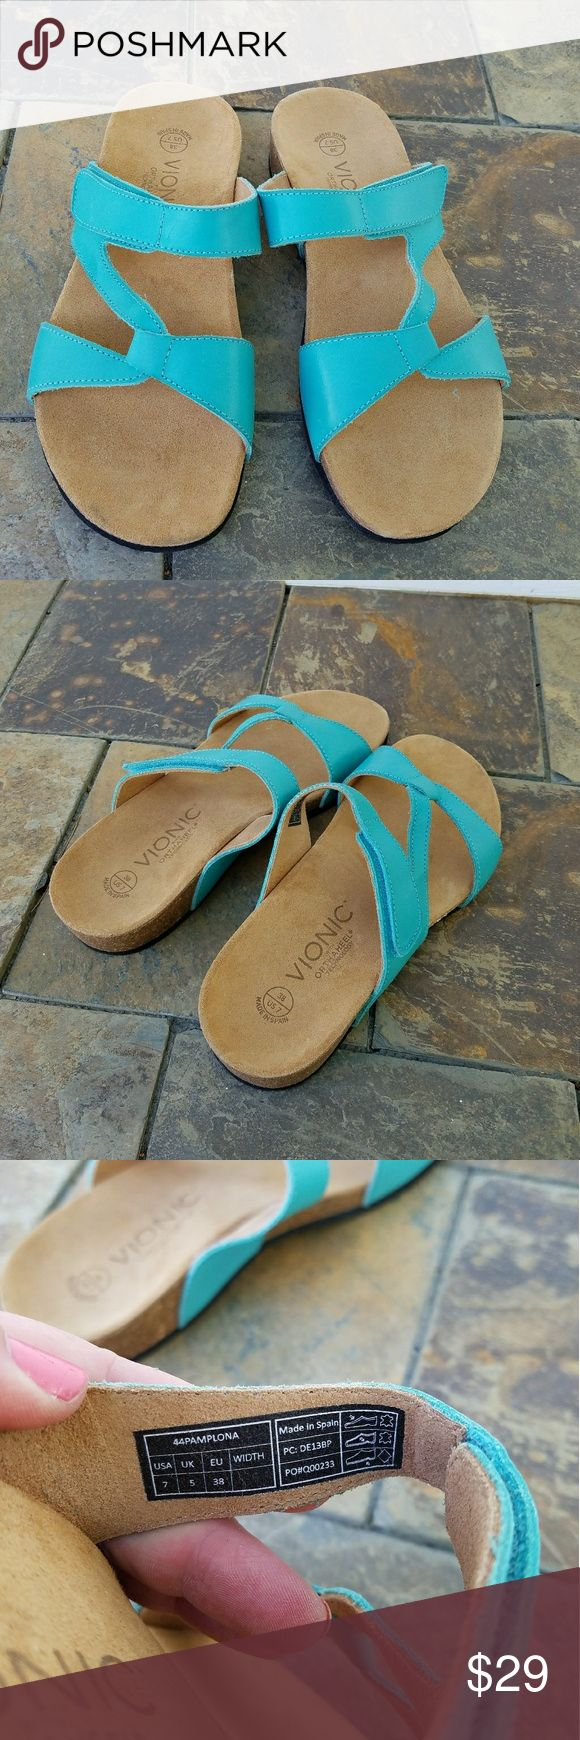 New Vionic Orthopedic Pamplona Sandals Size 7. Brand new without box.  Has orthoheel technology. Vionic Shoes Sandals